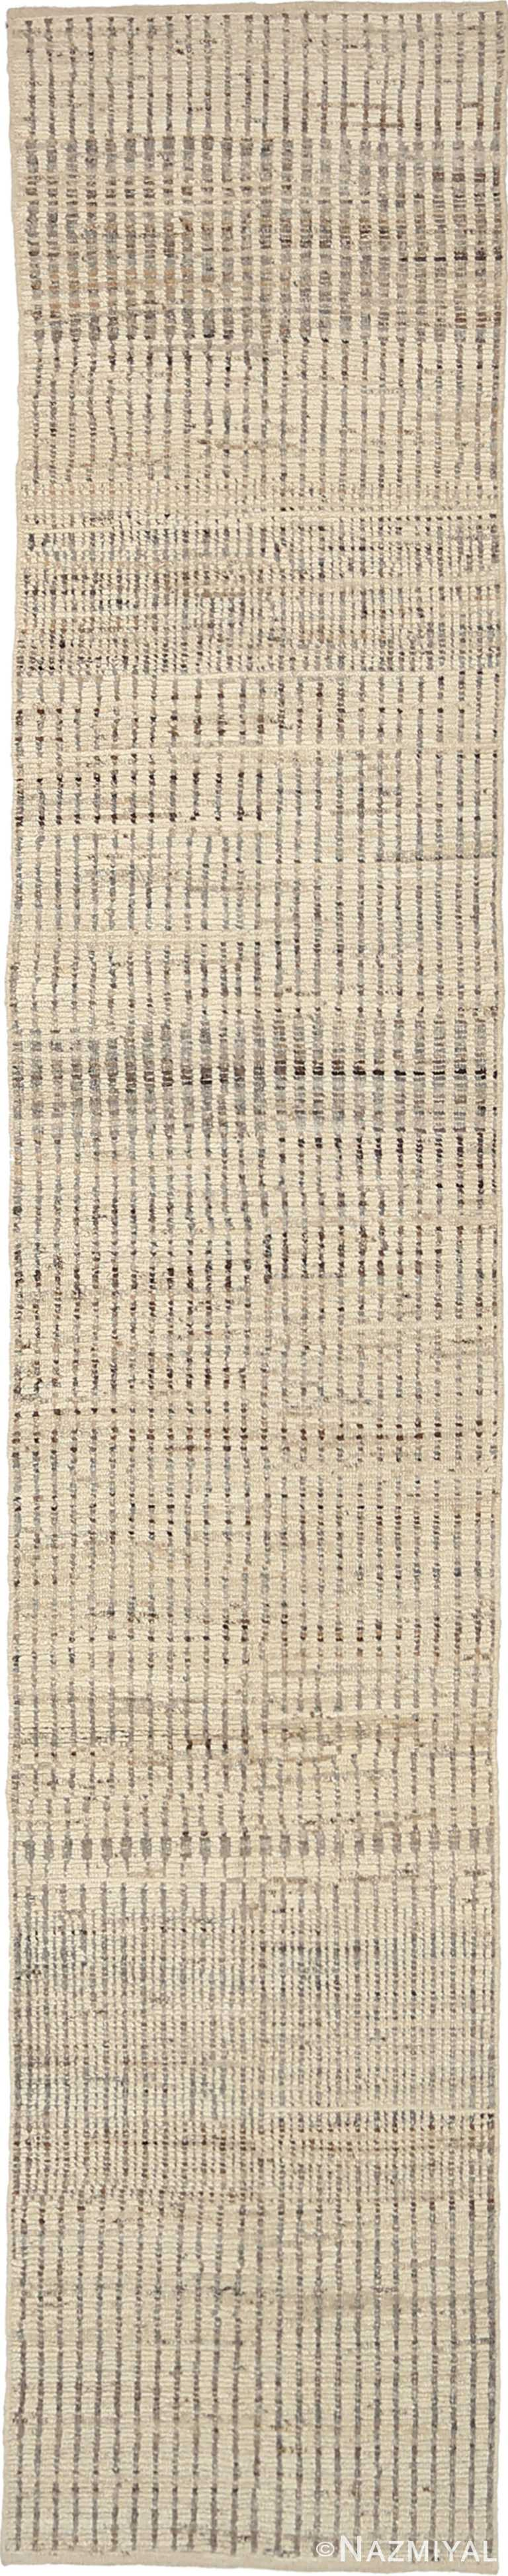 Beige Textured Modern Distressed Runner Rug 60881 by Nazmiyal Antique Rugs